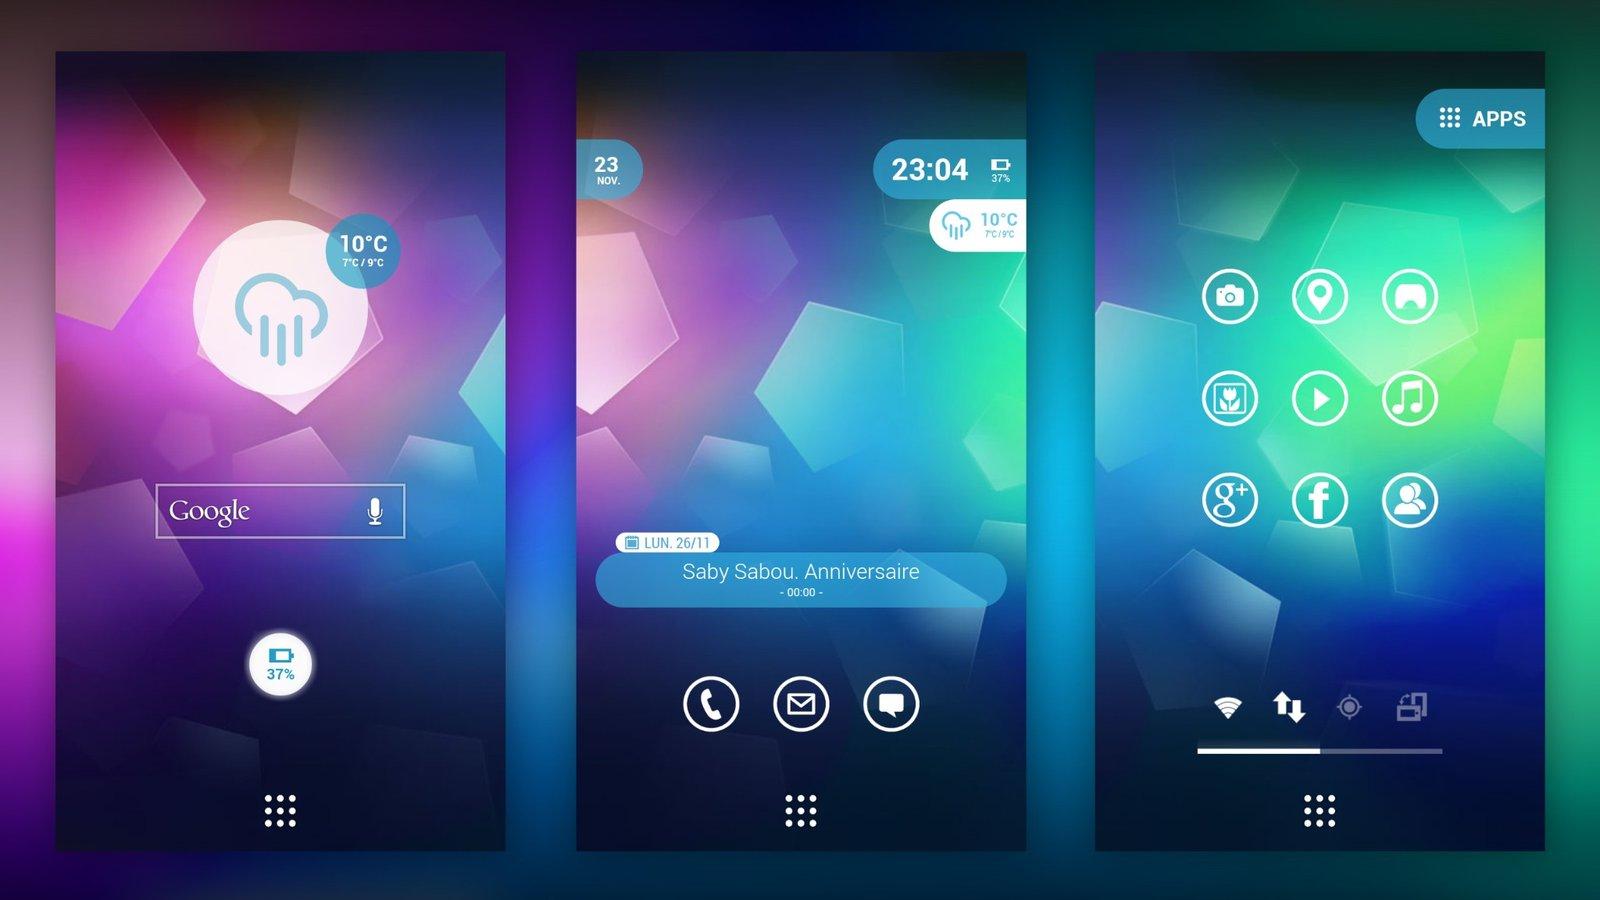 Beautiful   Wallpaper Home Screen Tablet - eSszUq  Trends_605219.jpg